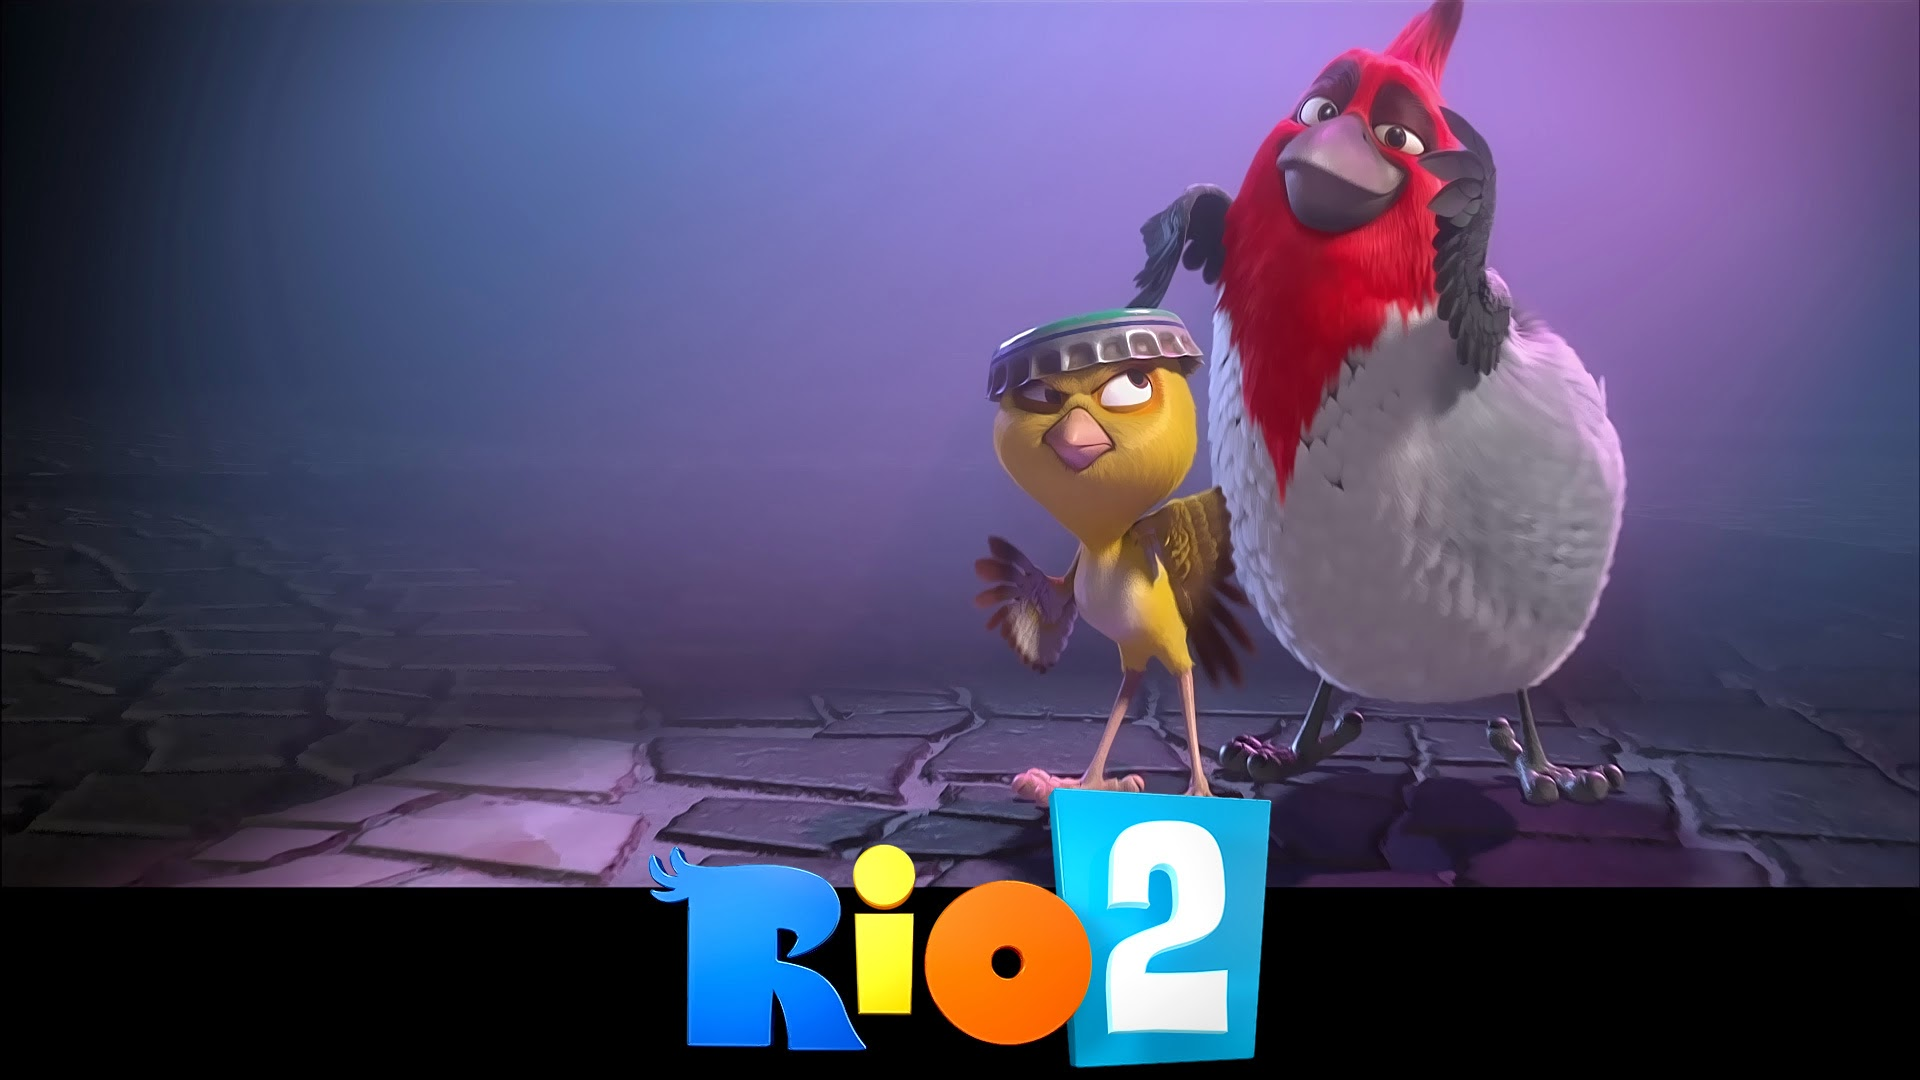 rio 2 movie 2014 hd wallpaper birds image photo 1920x1080 2k 1920x1080